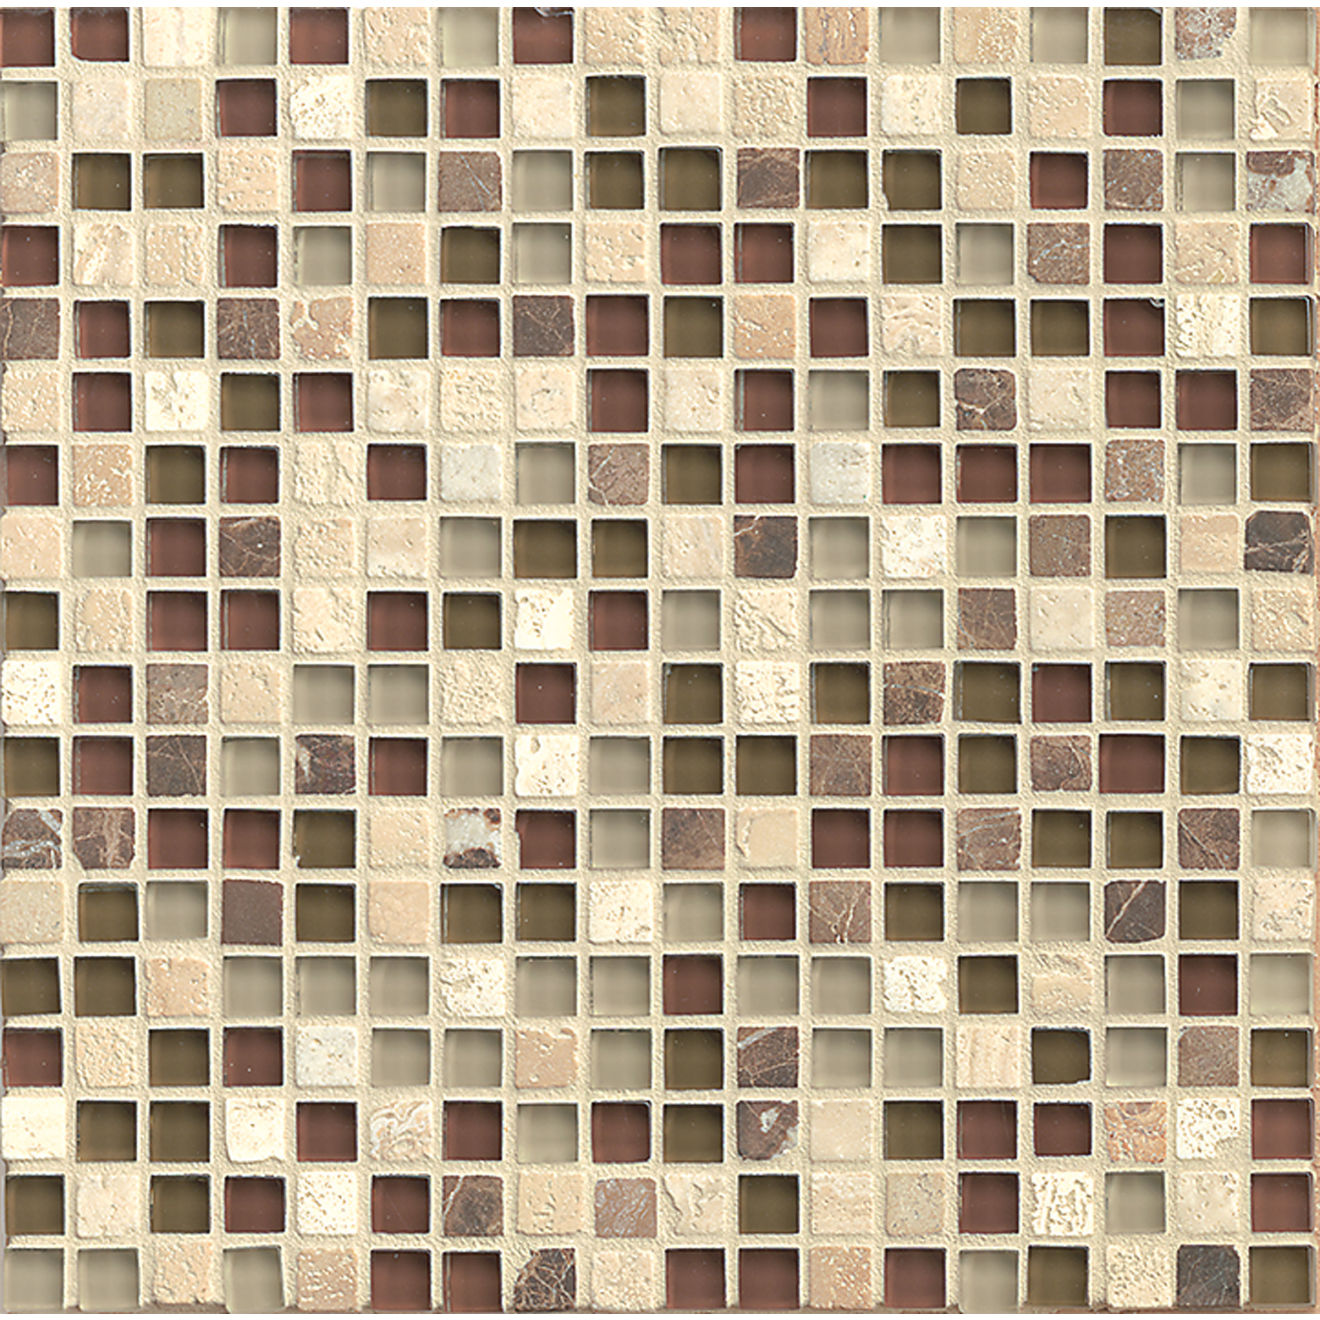 "Eclipse 5/8"" x 5/8"" Wall Mosaic in Merlot"